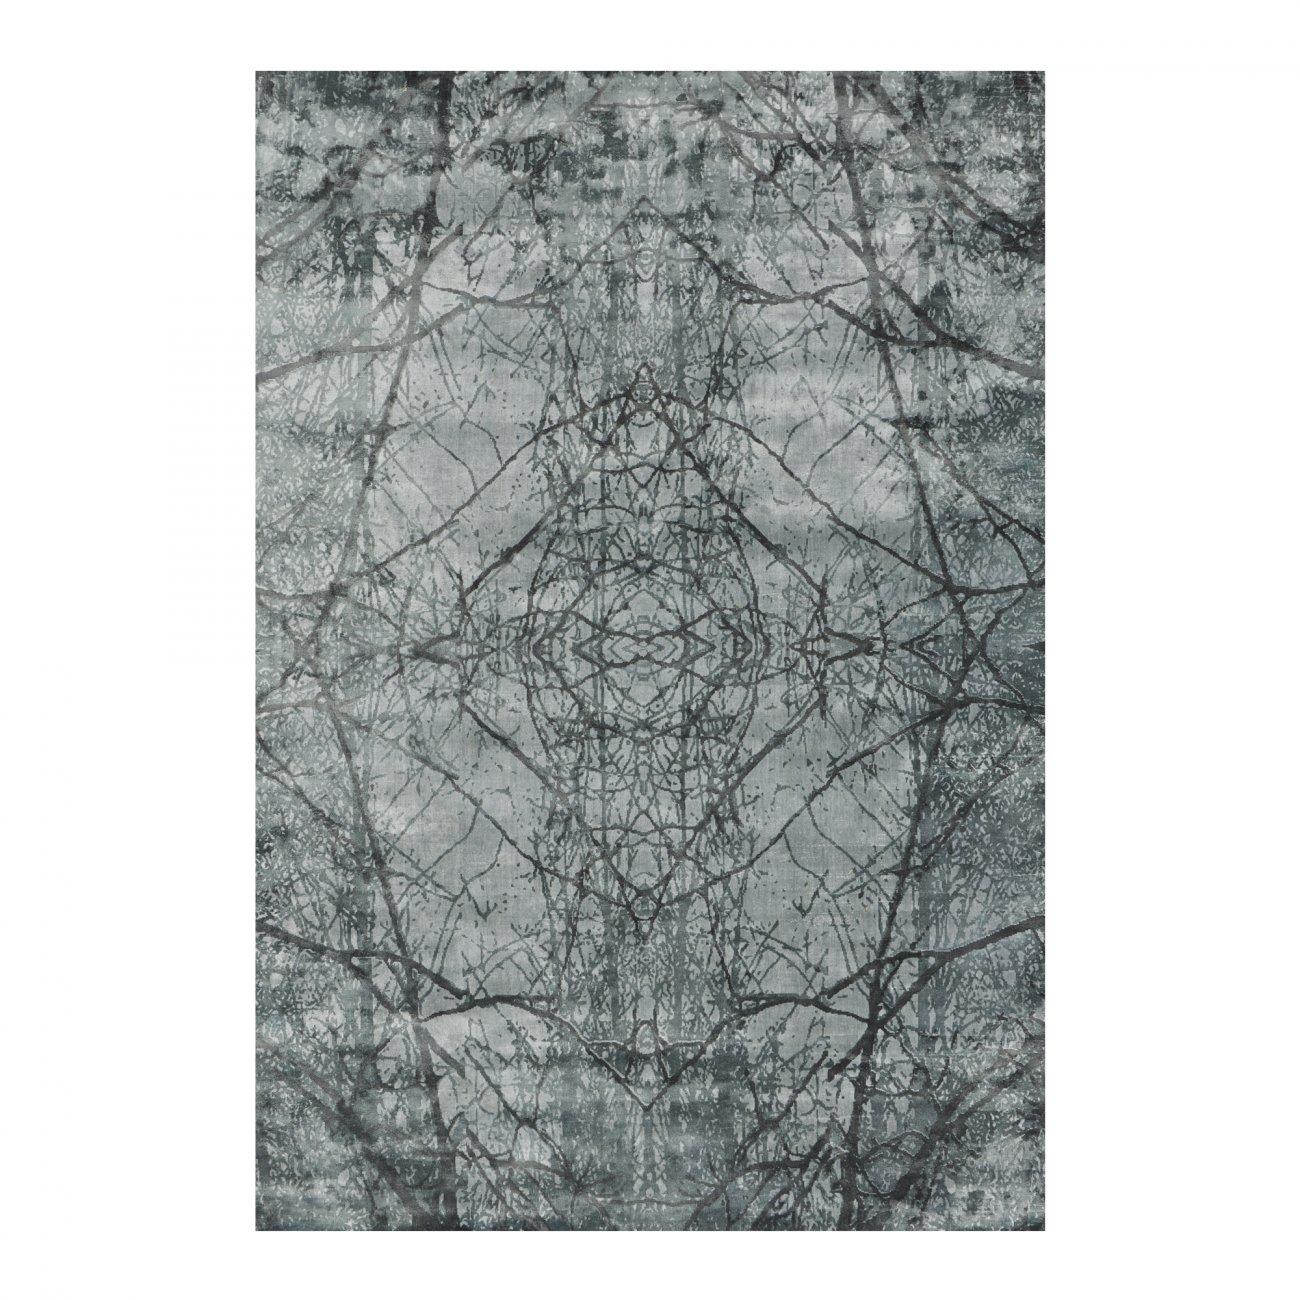 Viskosmatta AIMI 170 x 200 cm slate, Linie Design